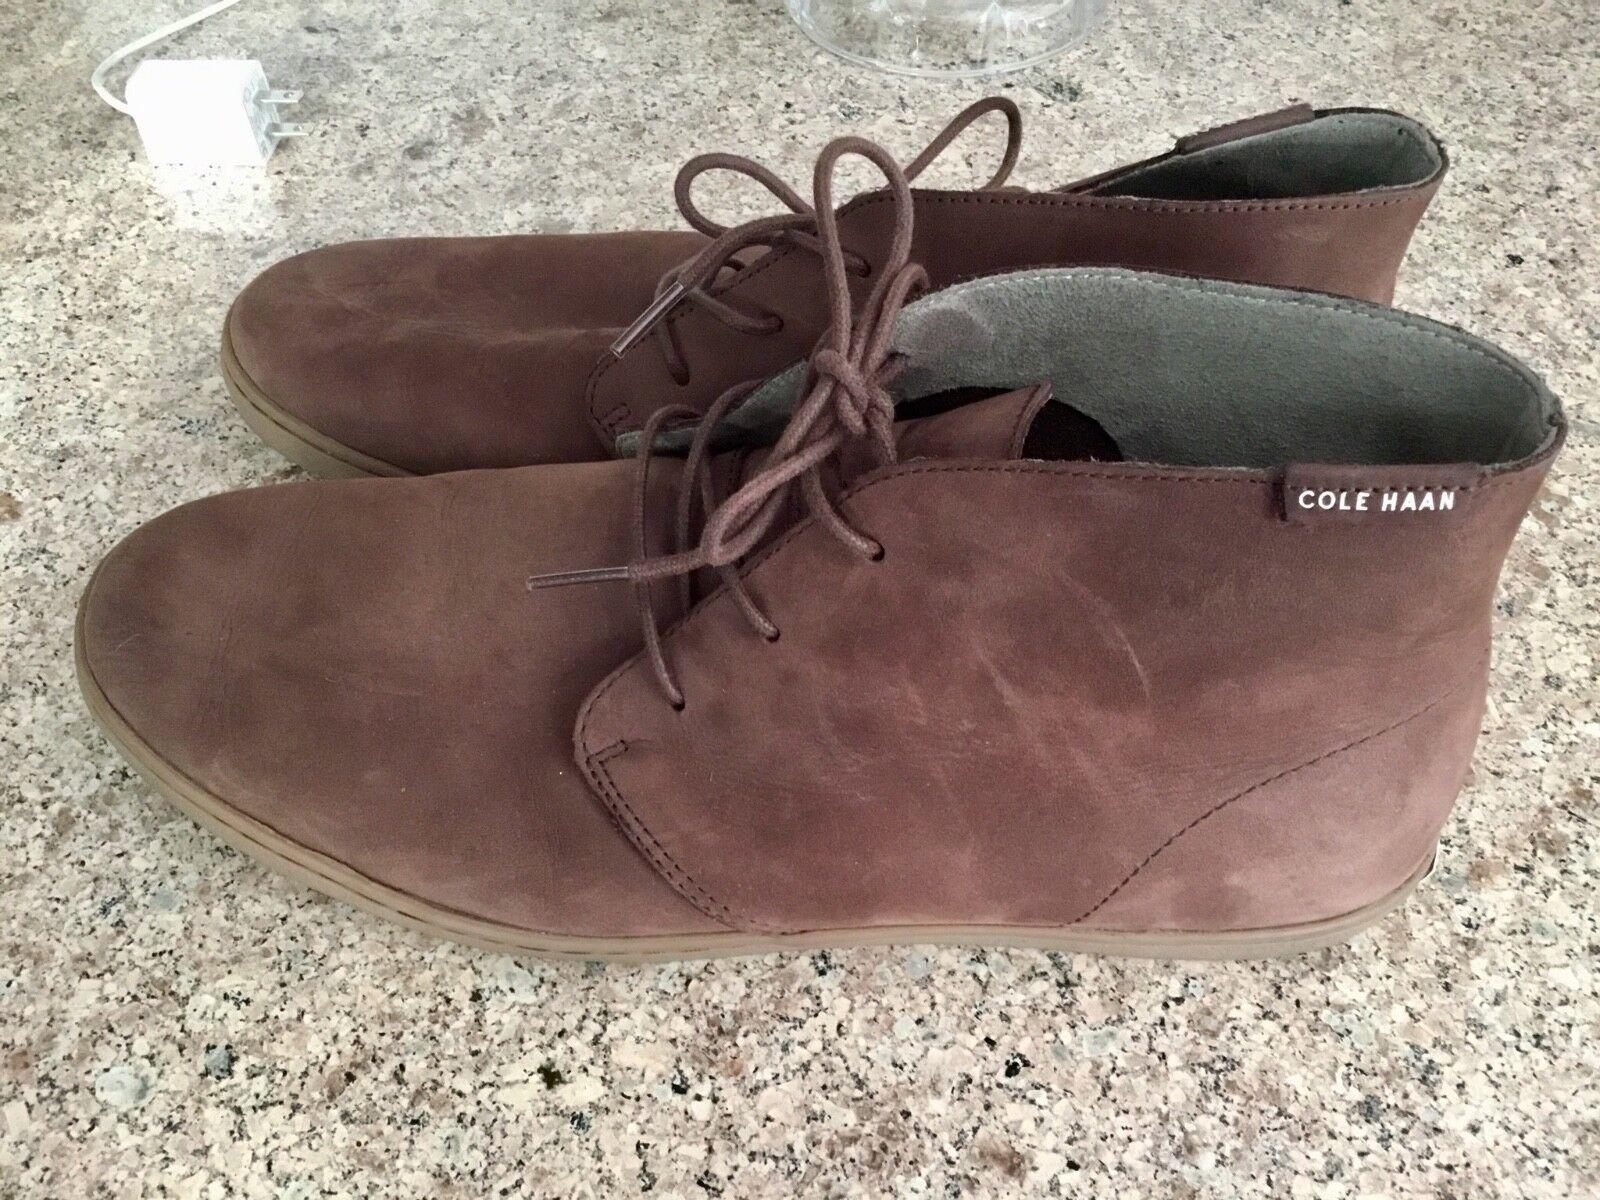 Cole Haan Mens Pinch Weekender Chukka Boot shoes Brown Suede Sz 11.5 M